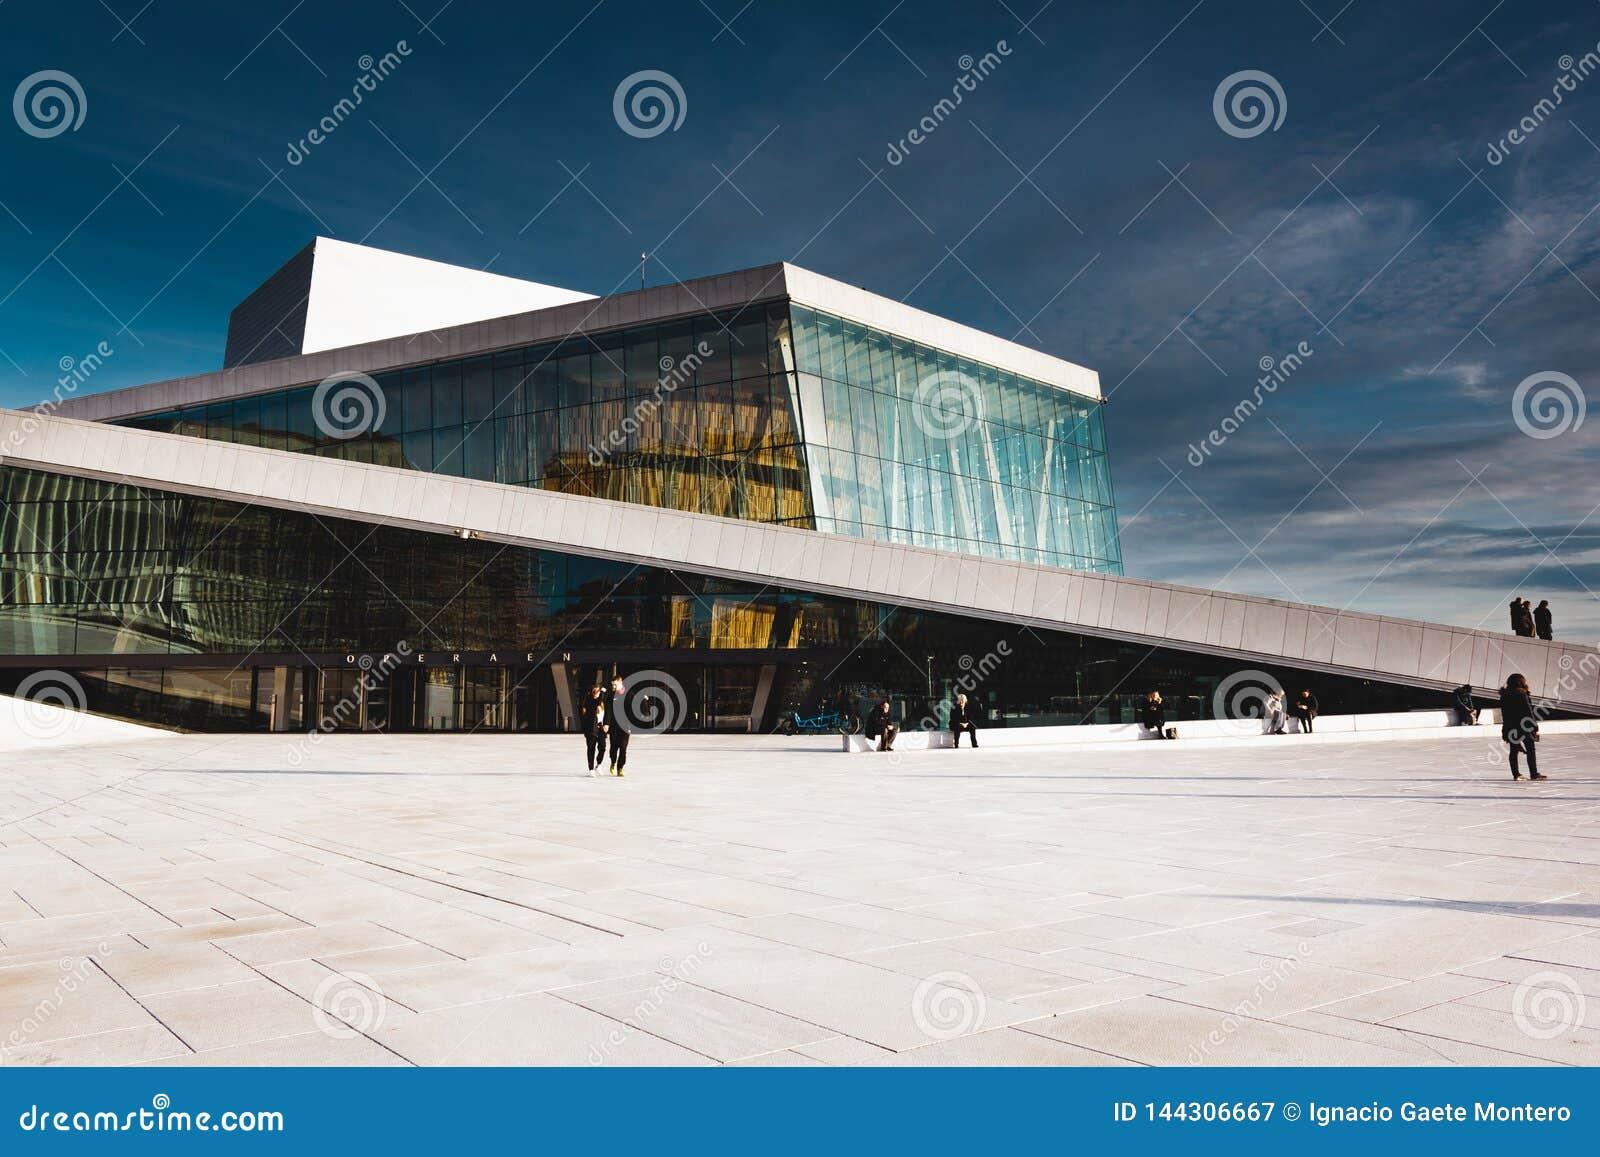 El teatro de la ópera de Oslo, Operahuset